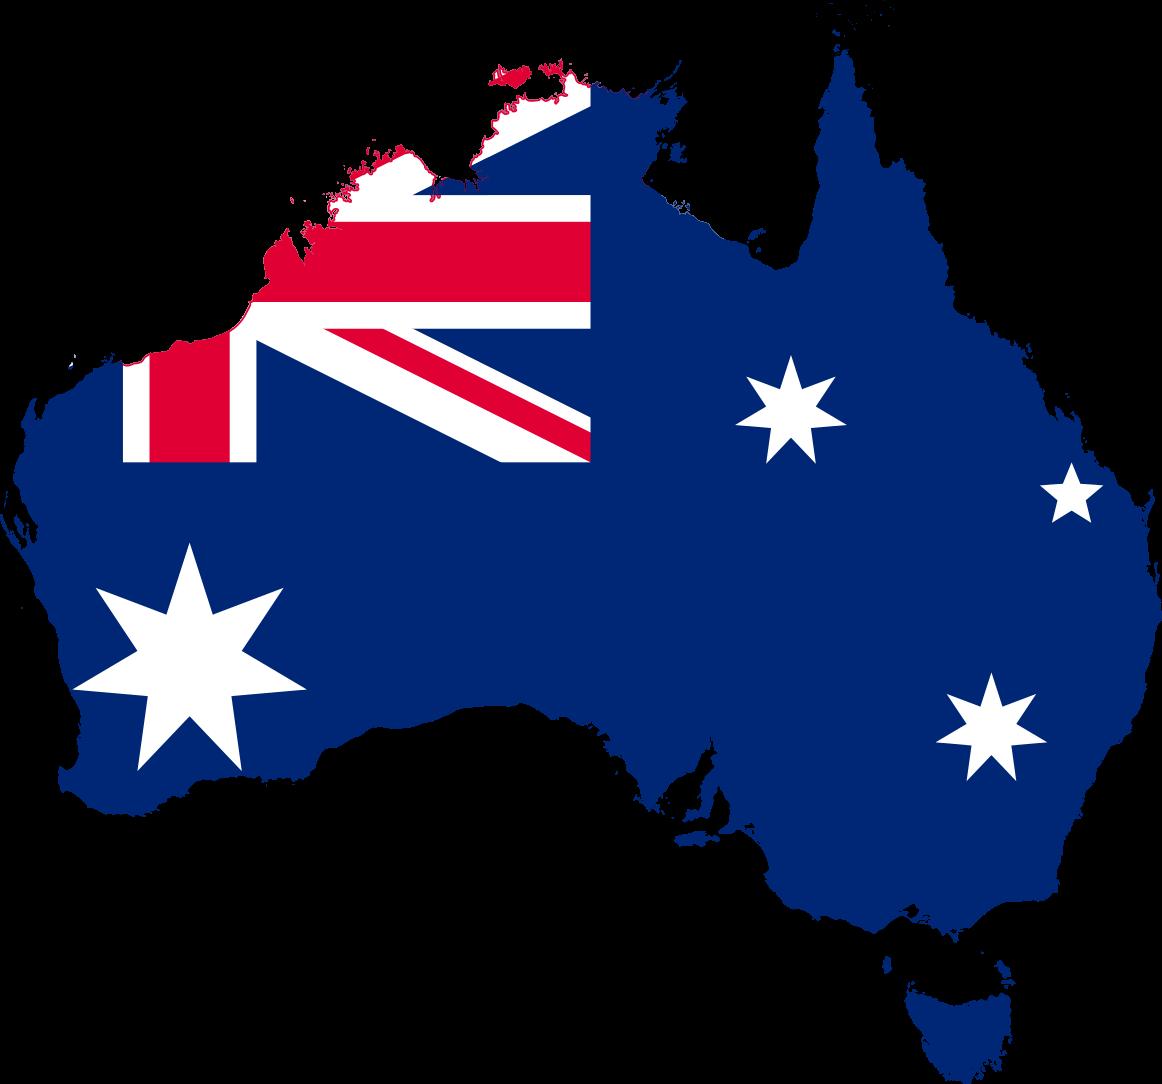 australia flag map image png